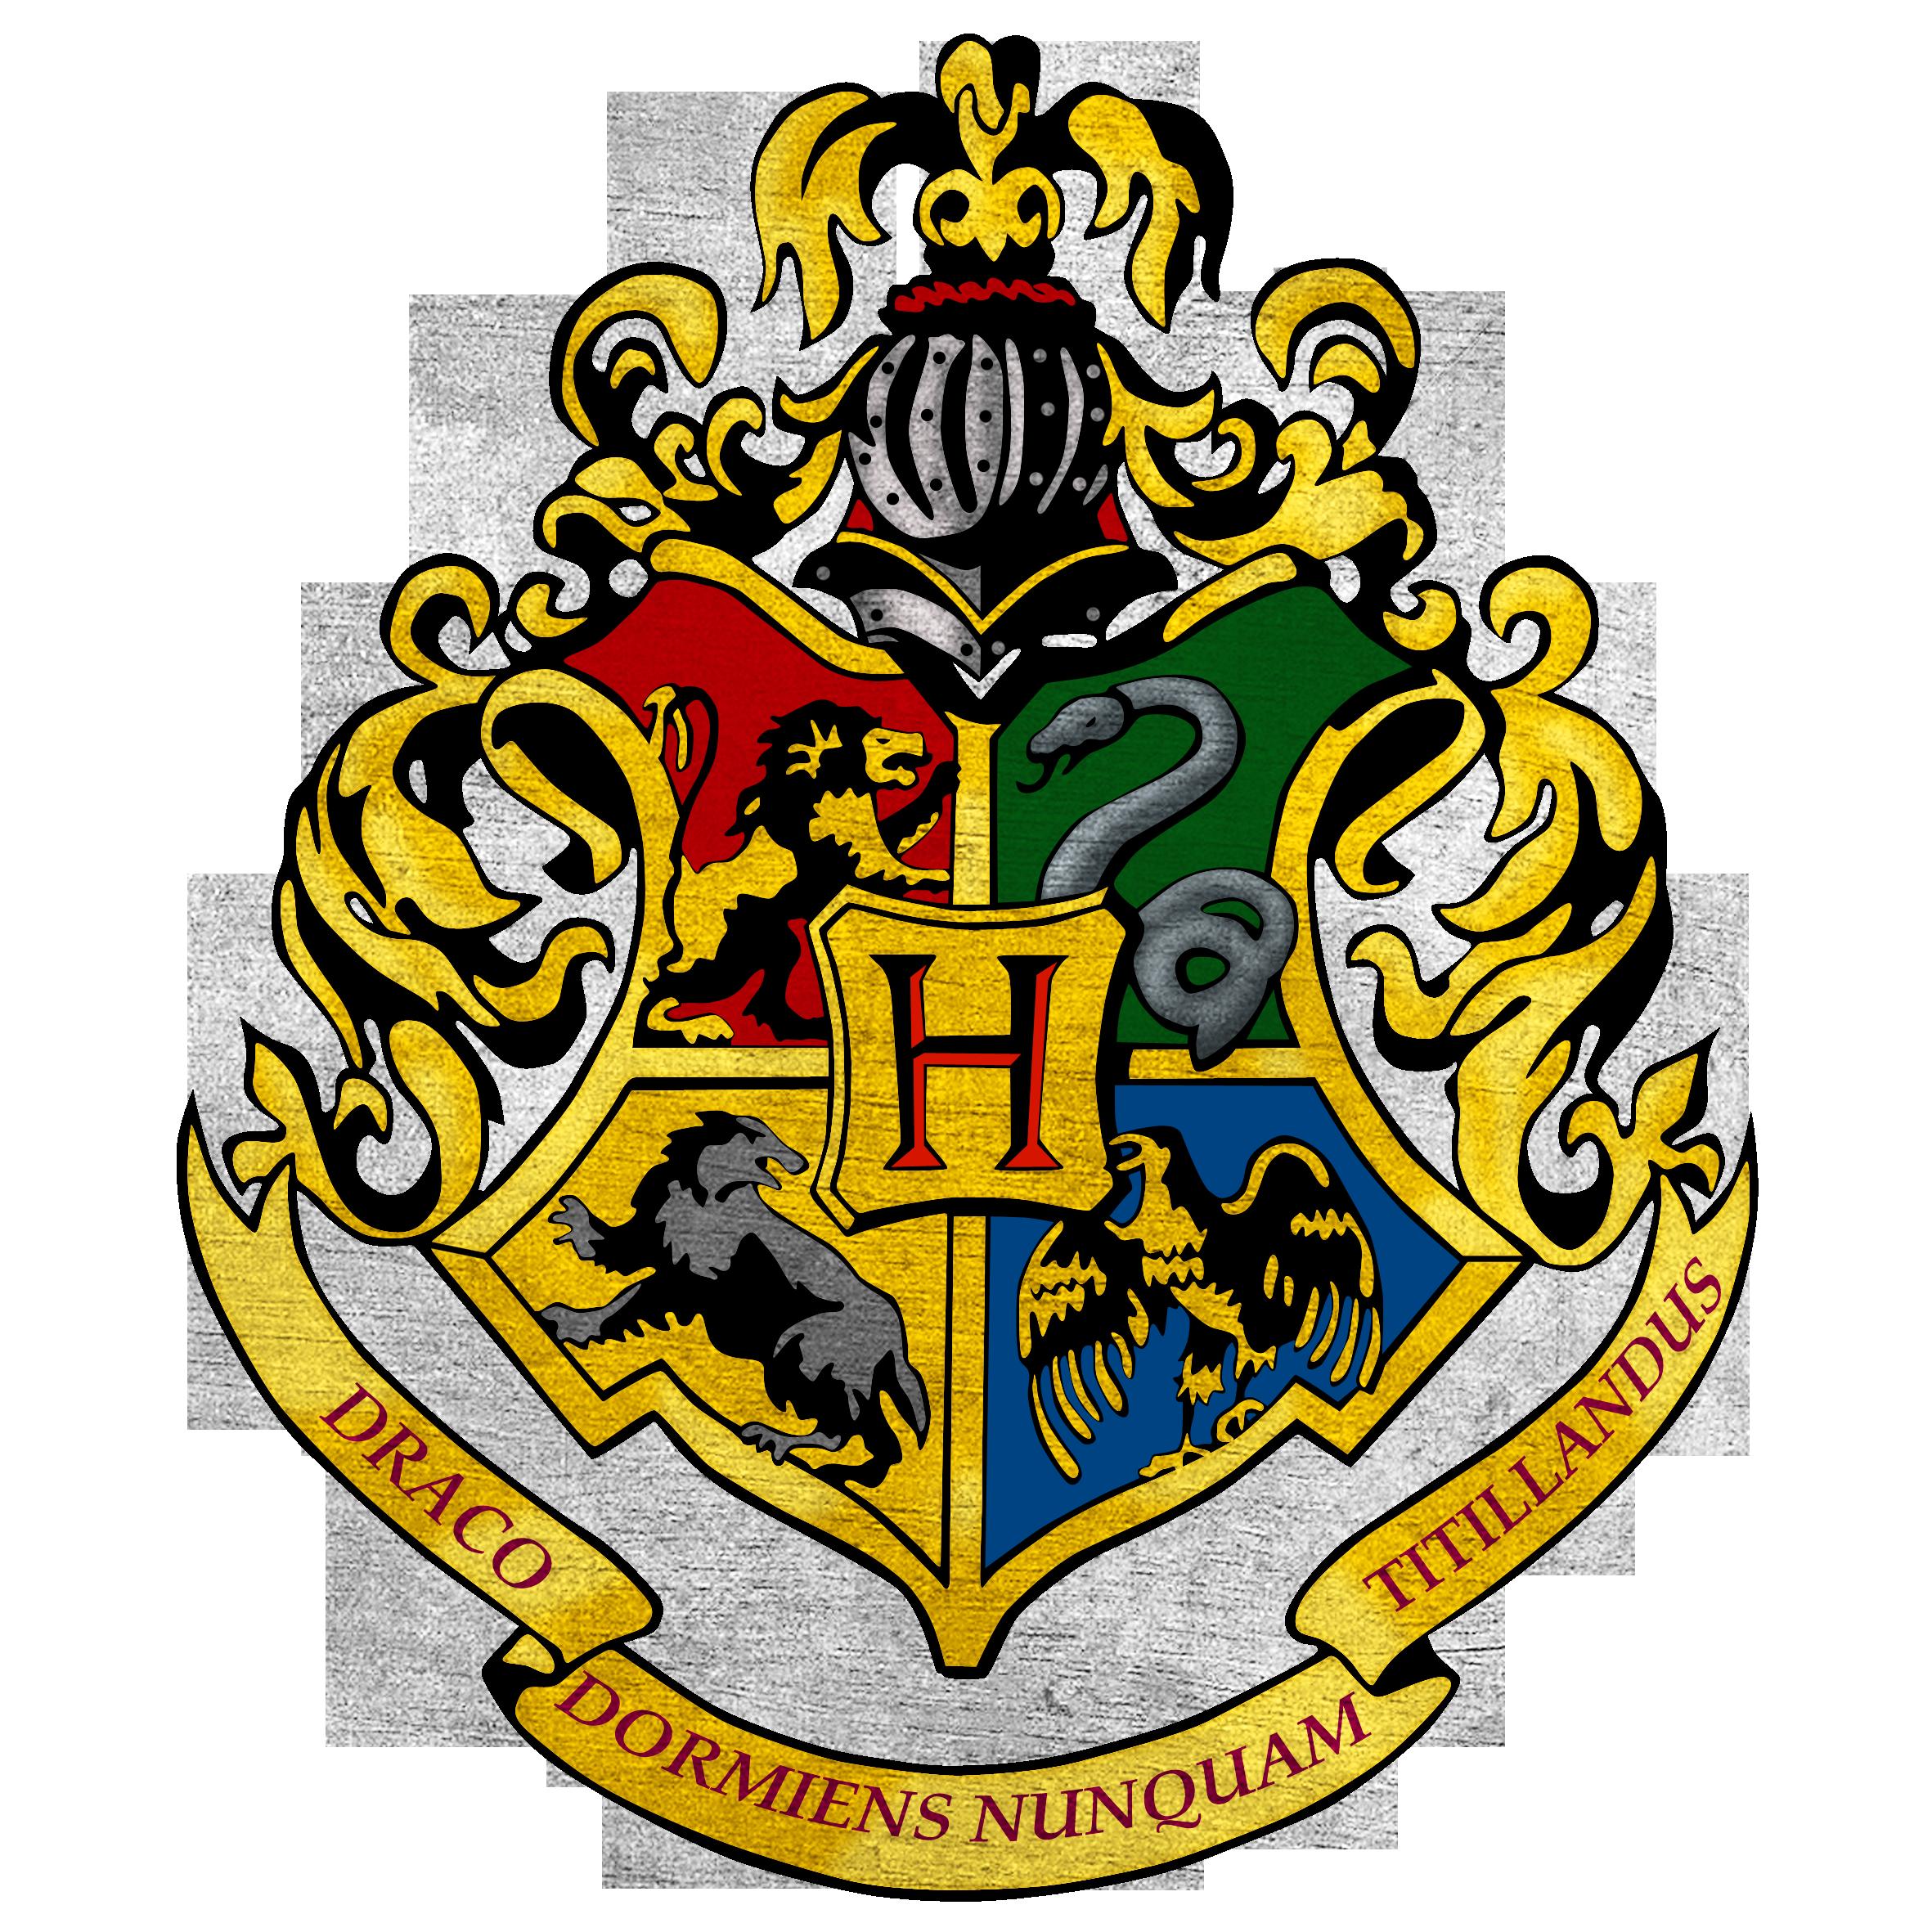 hogwarts logo by shadopro on deviantart